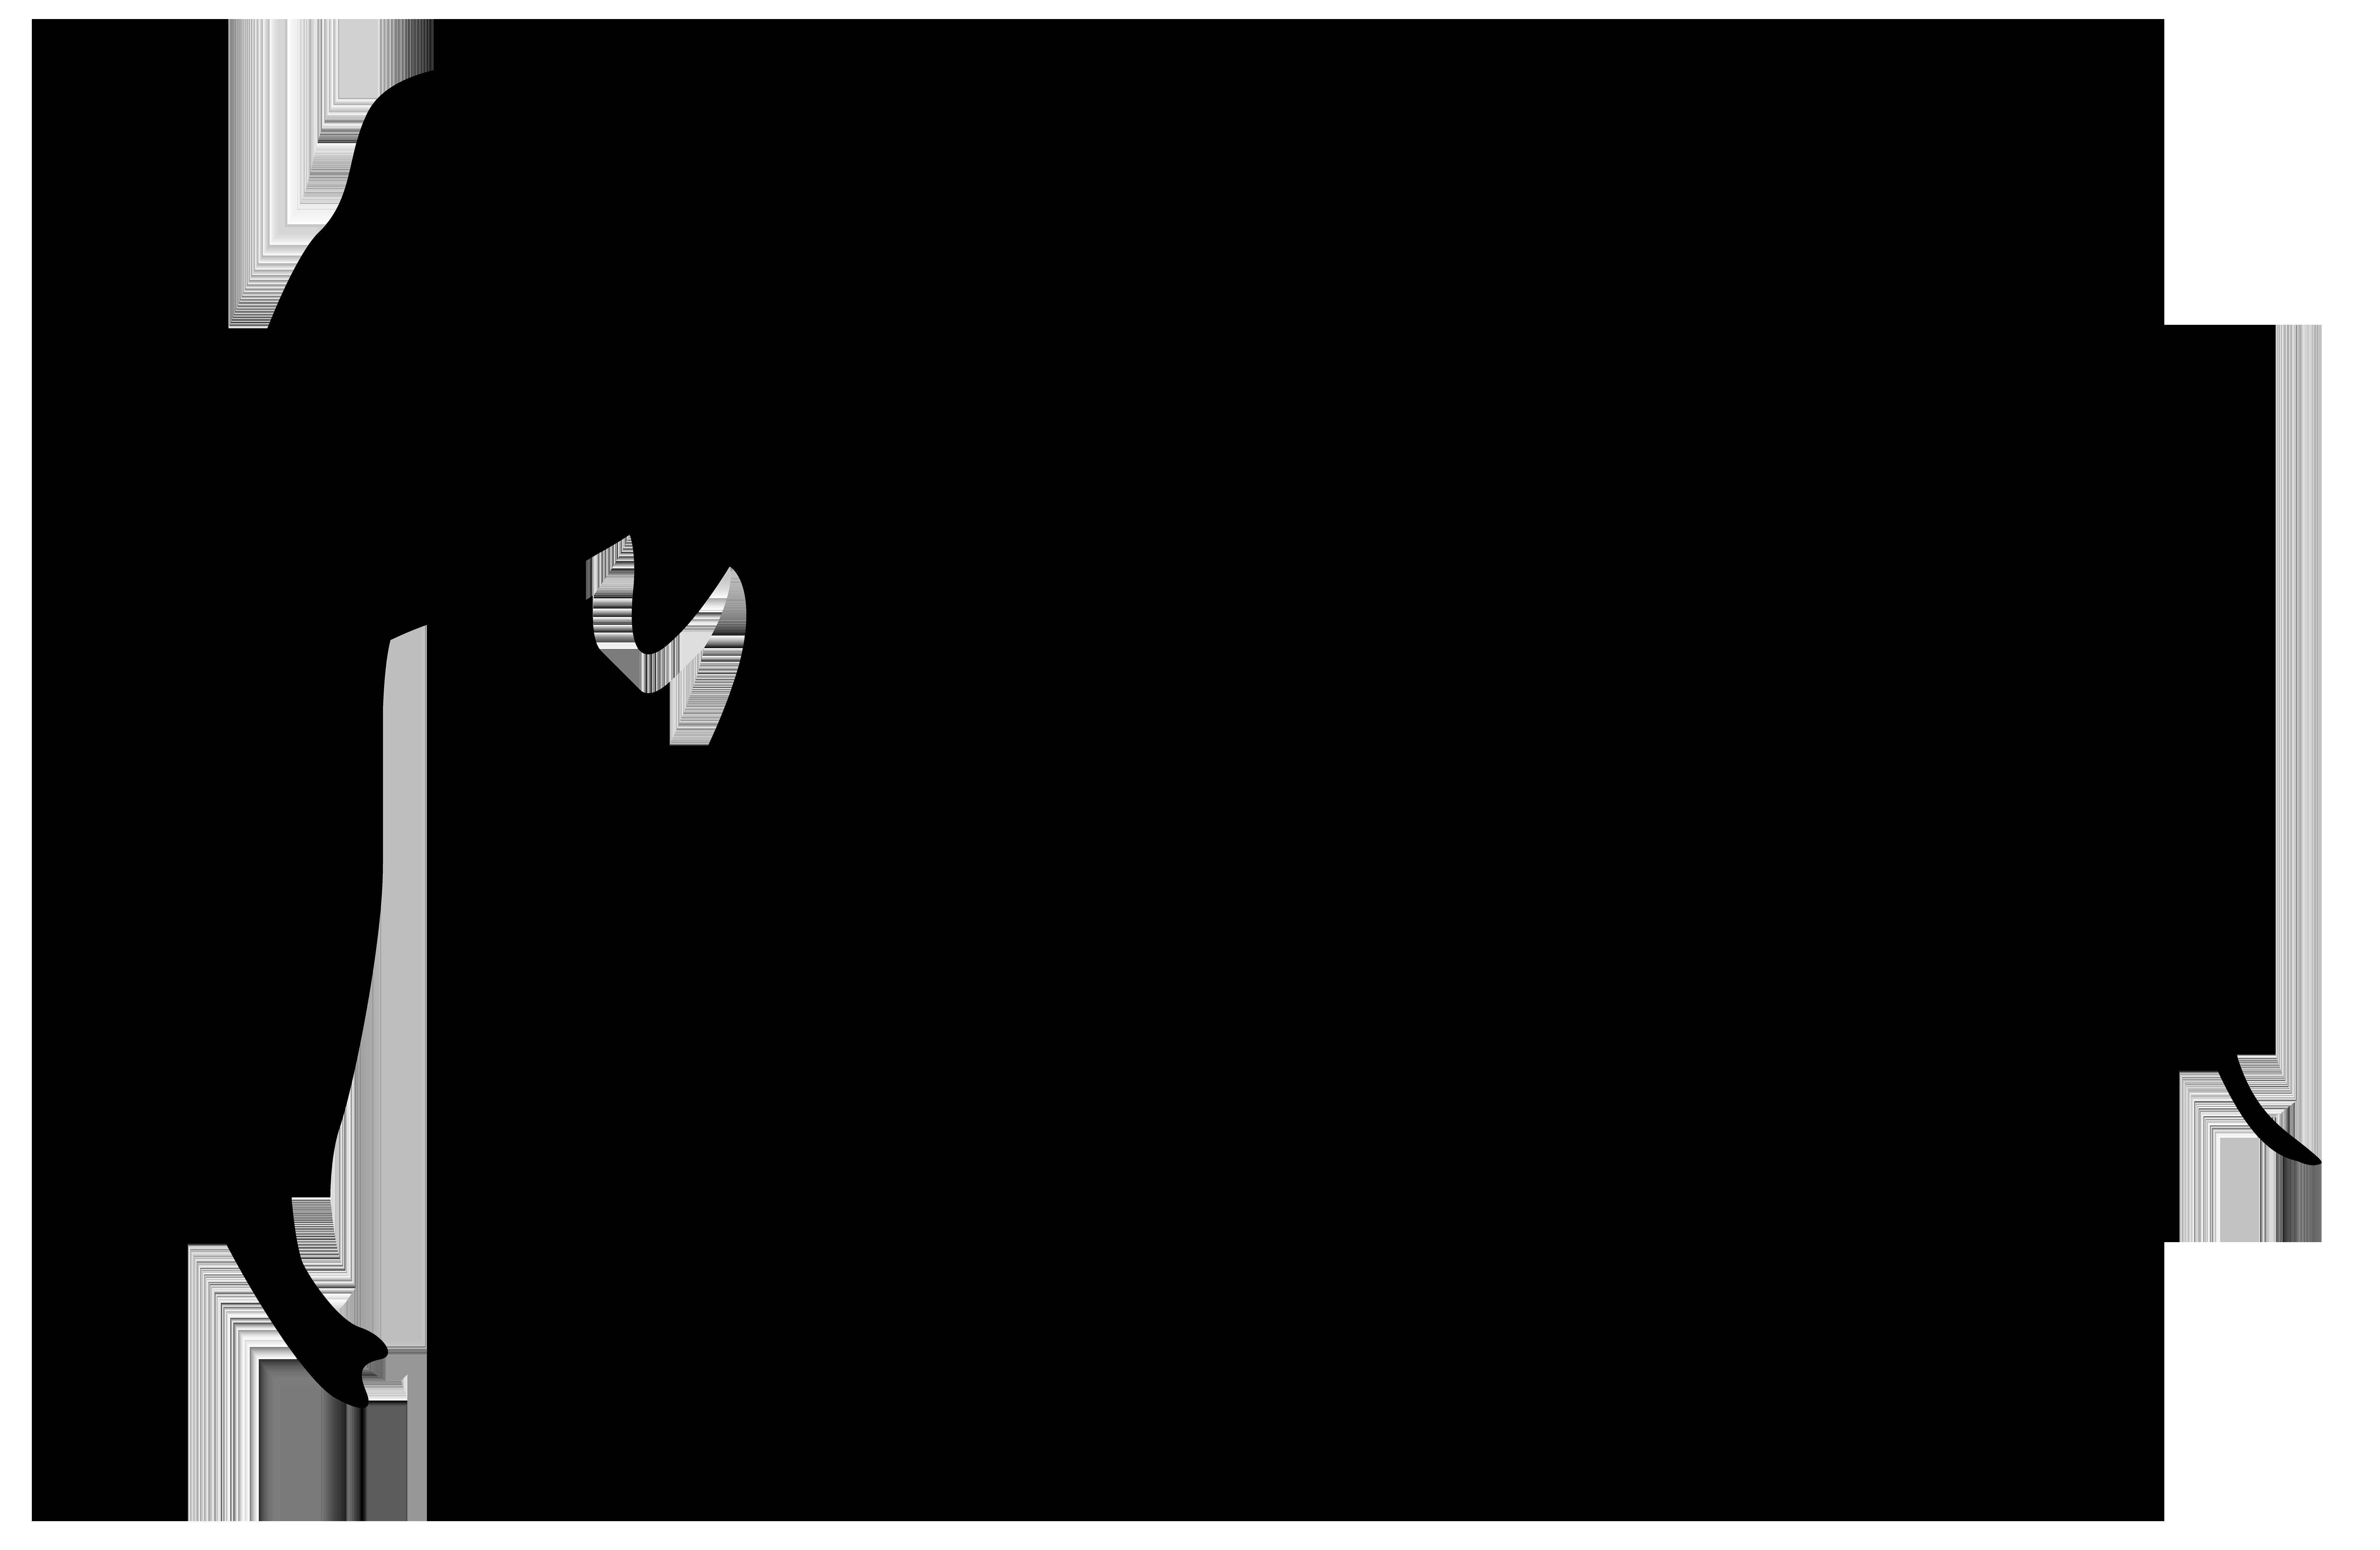 8000x5211 Elephant Silhouette Png Clip Art Imageu200b Gallery Yopriceville